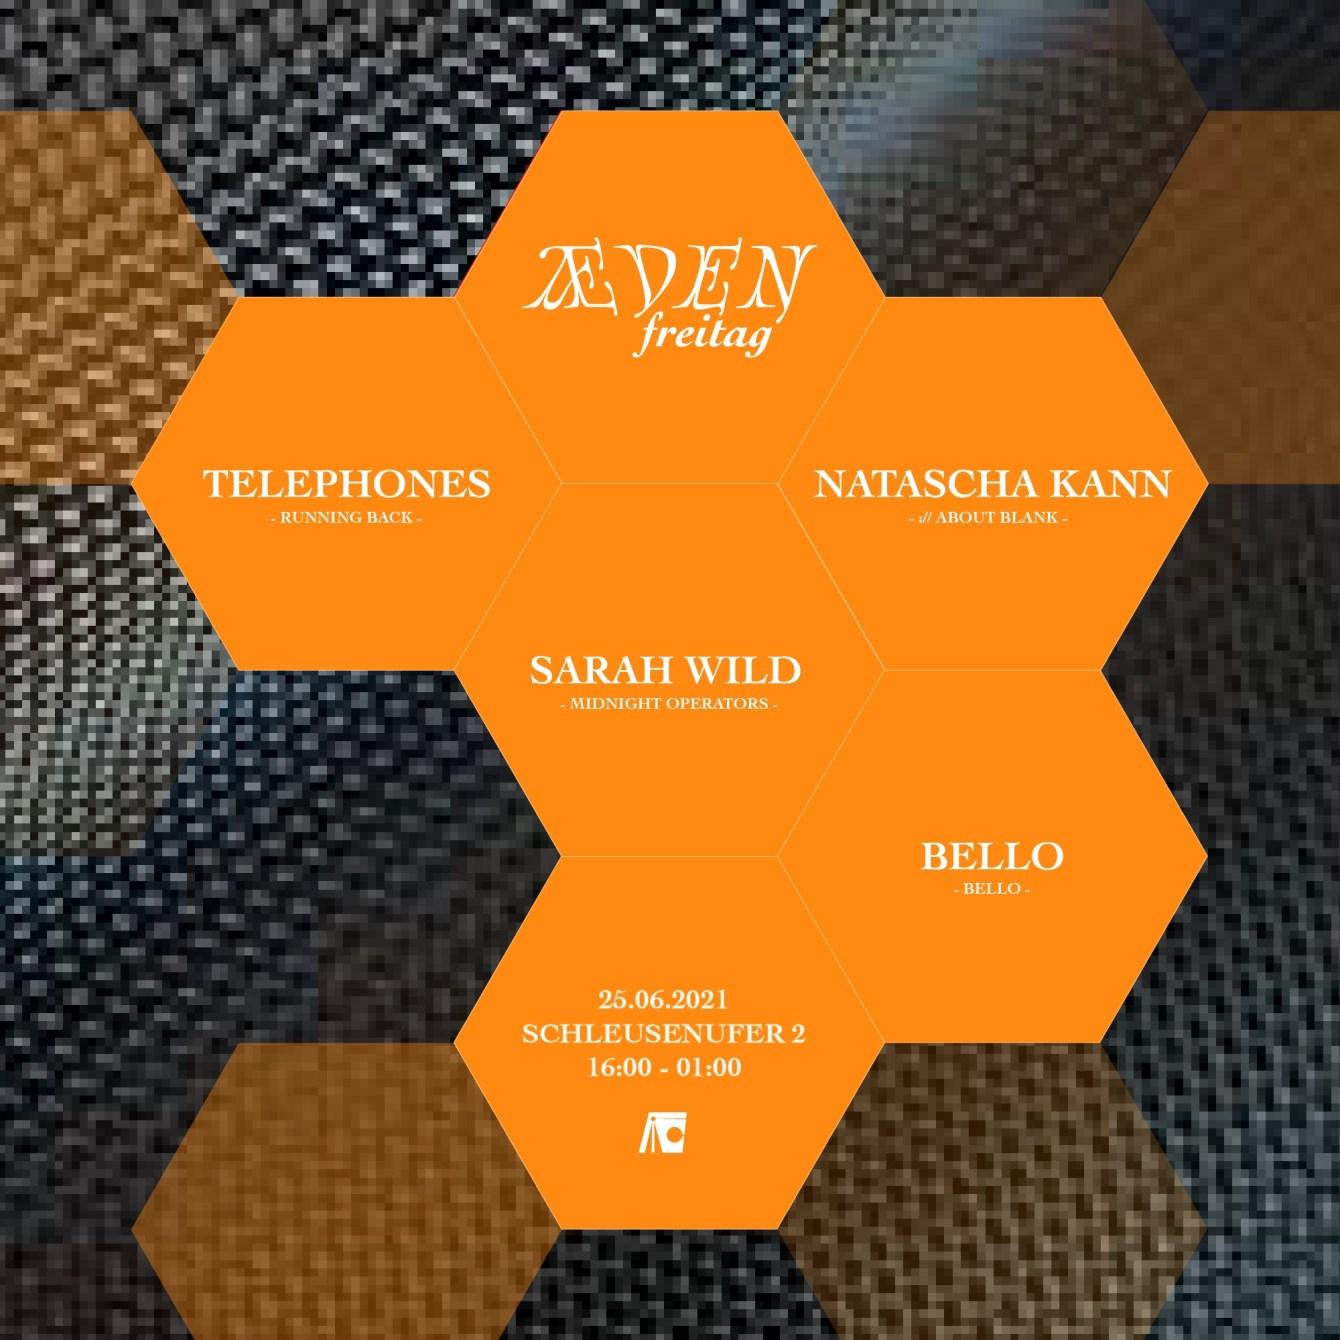 Æden Freitag: Telephones, Natascha Kann, Sarah Wild, Bello - Flyer front